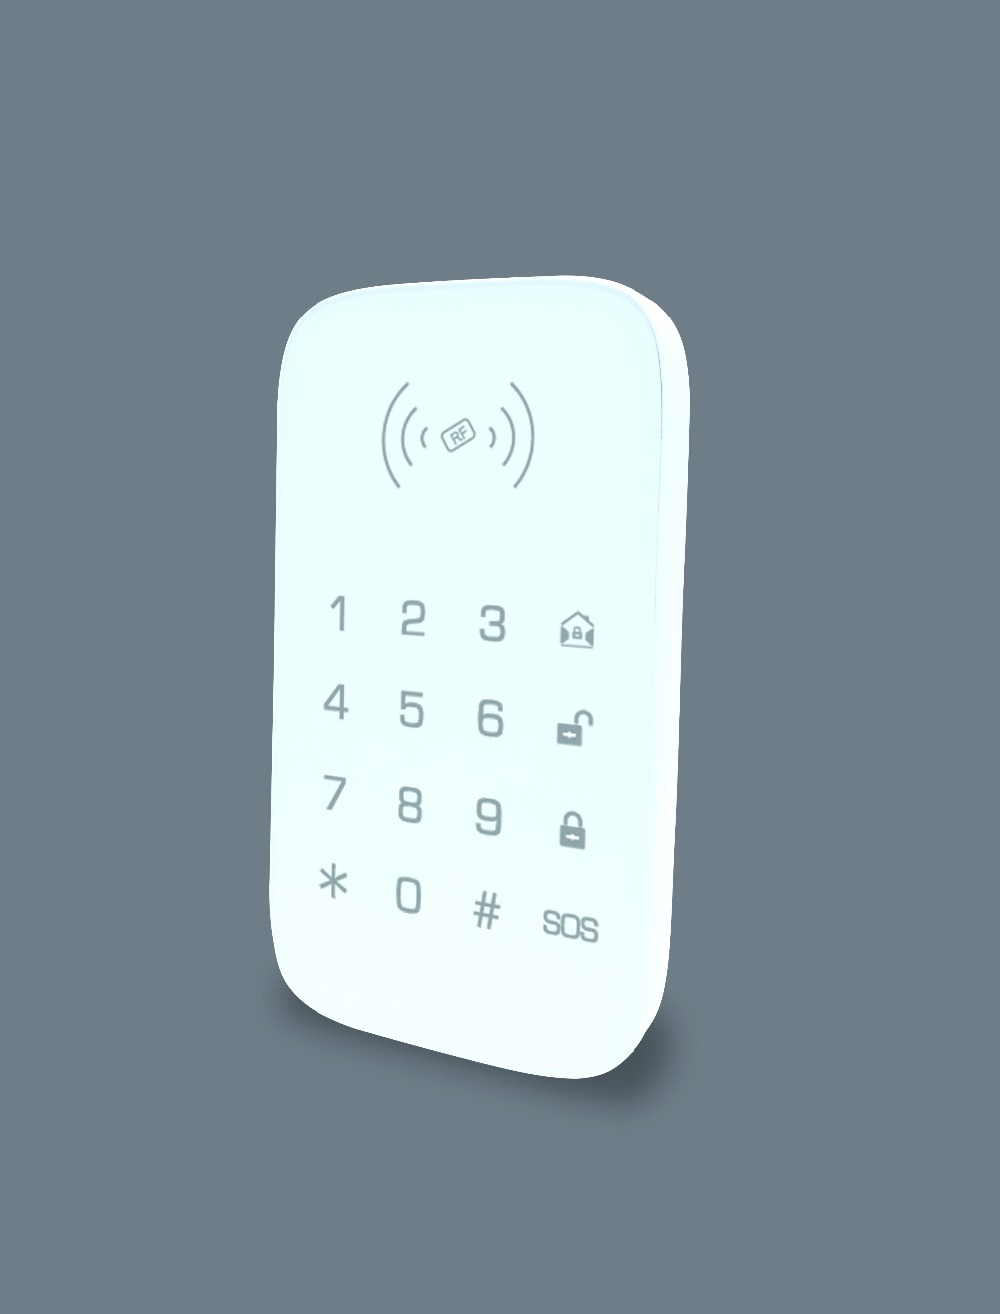 tela sensivel ao toque teclado rfid teclado com 2 smartyiba pcs etiquetas rfid cartoes de leitura